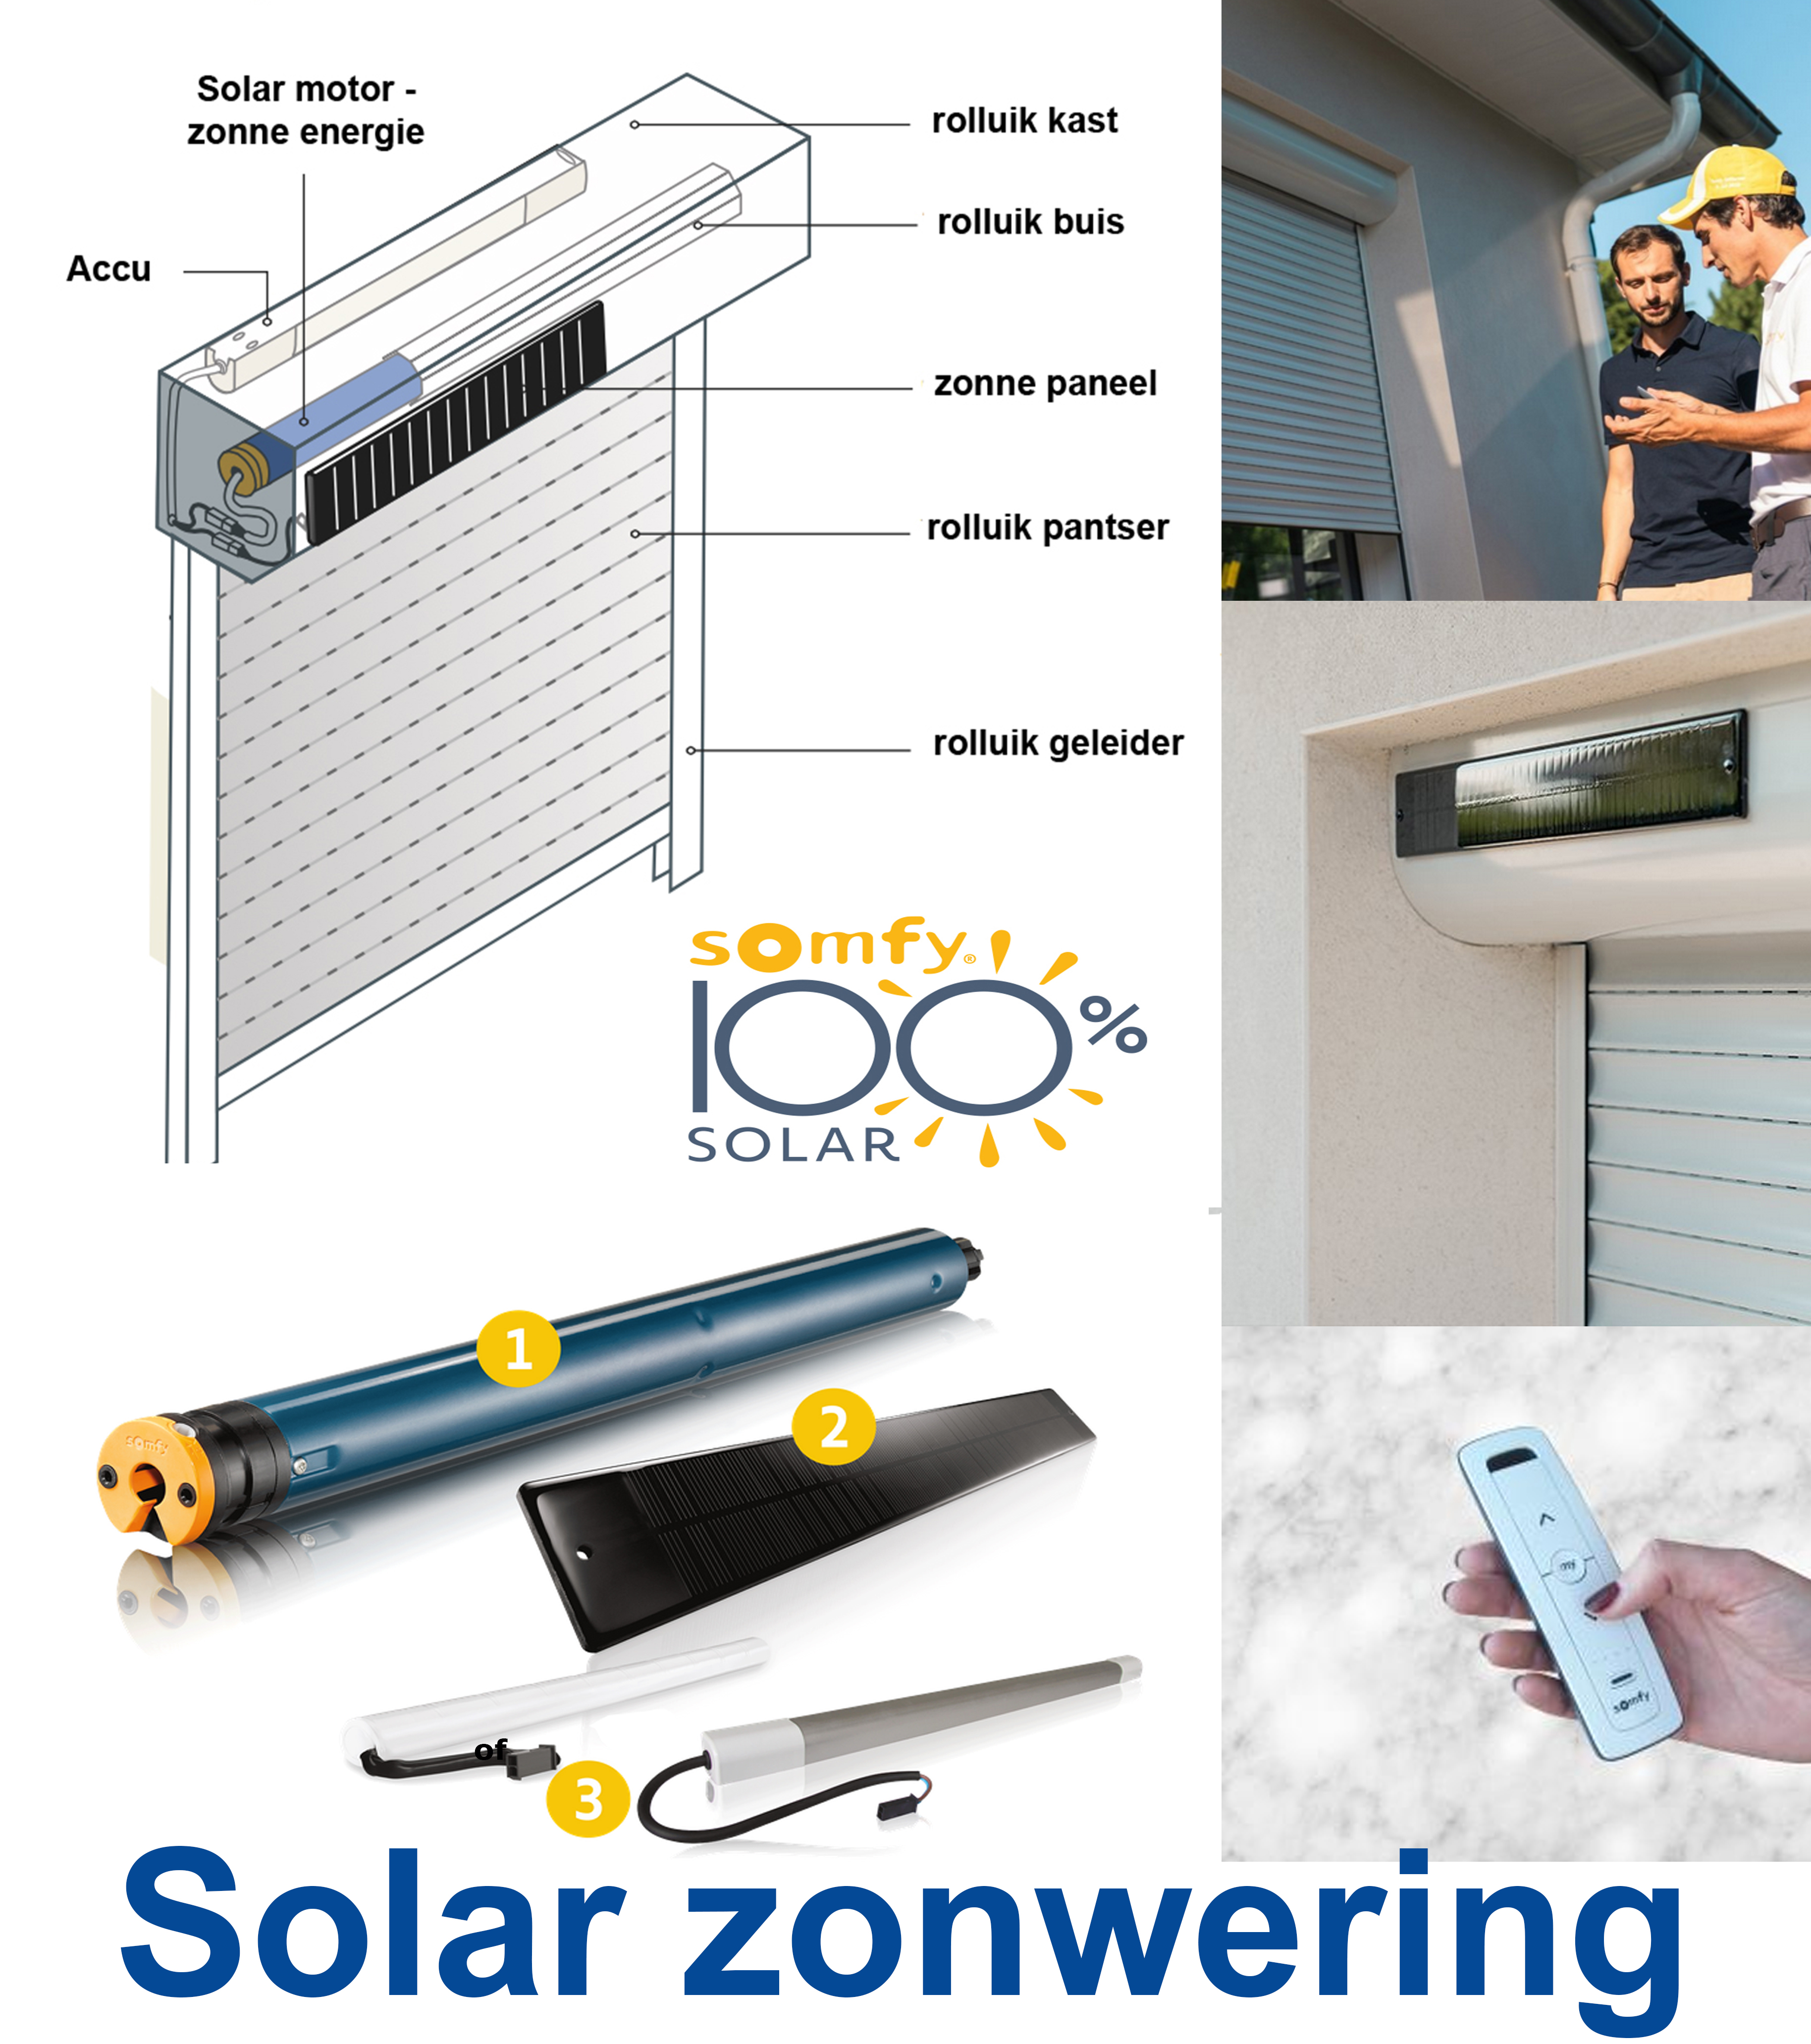 Solar zonwering